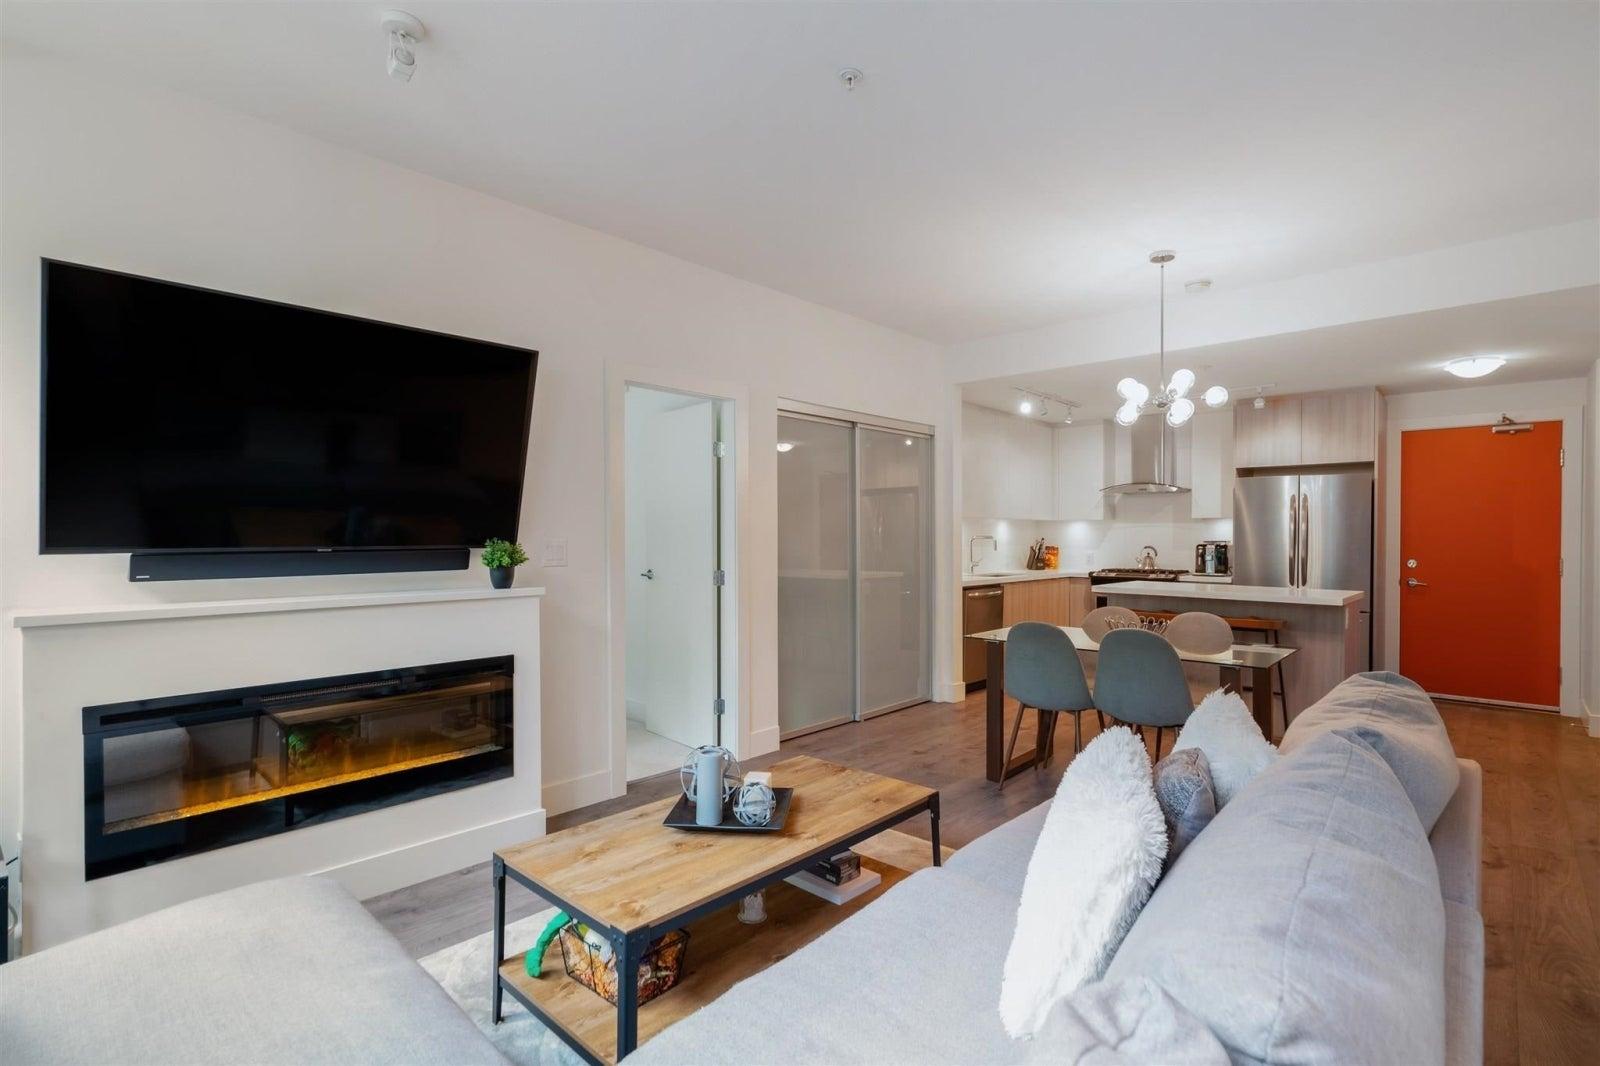 222 3602 ALDERCREST DRIVE - Roche Point Apartment/Condo for sale, 2 Bedrooms (R2603975) #2